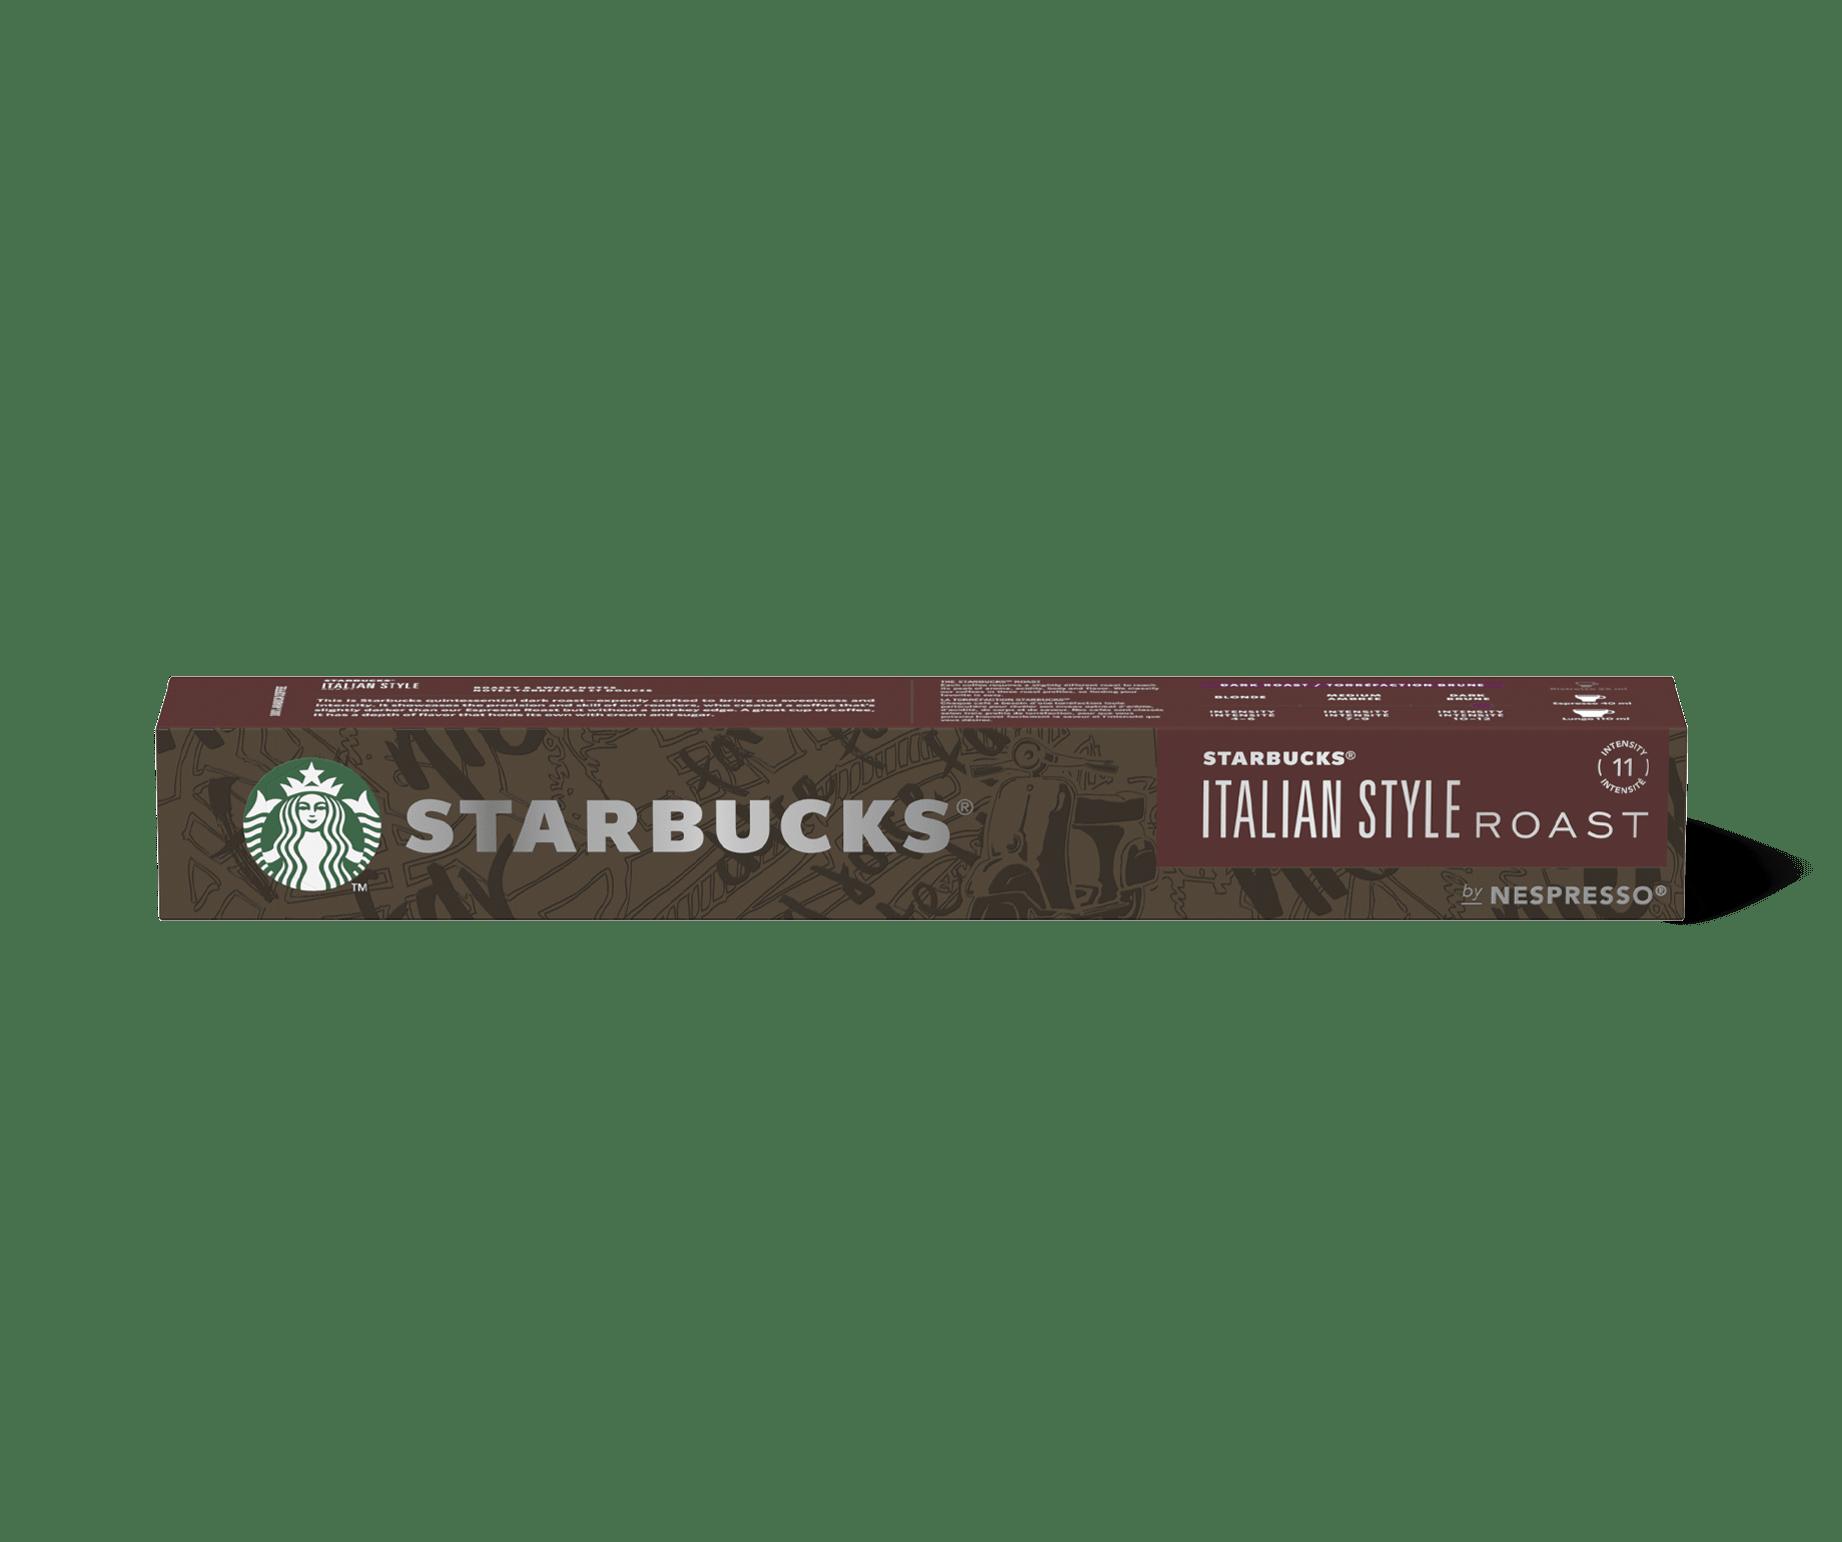 Starbucks_Italian_Style_Roast_Nespresso_Longshadow